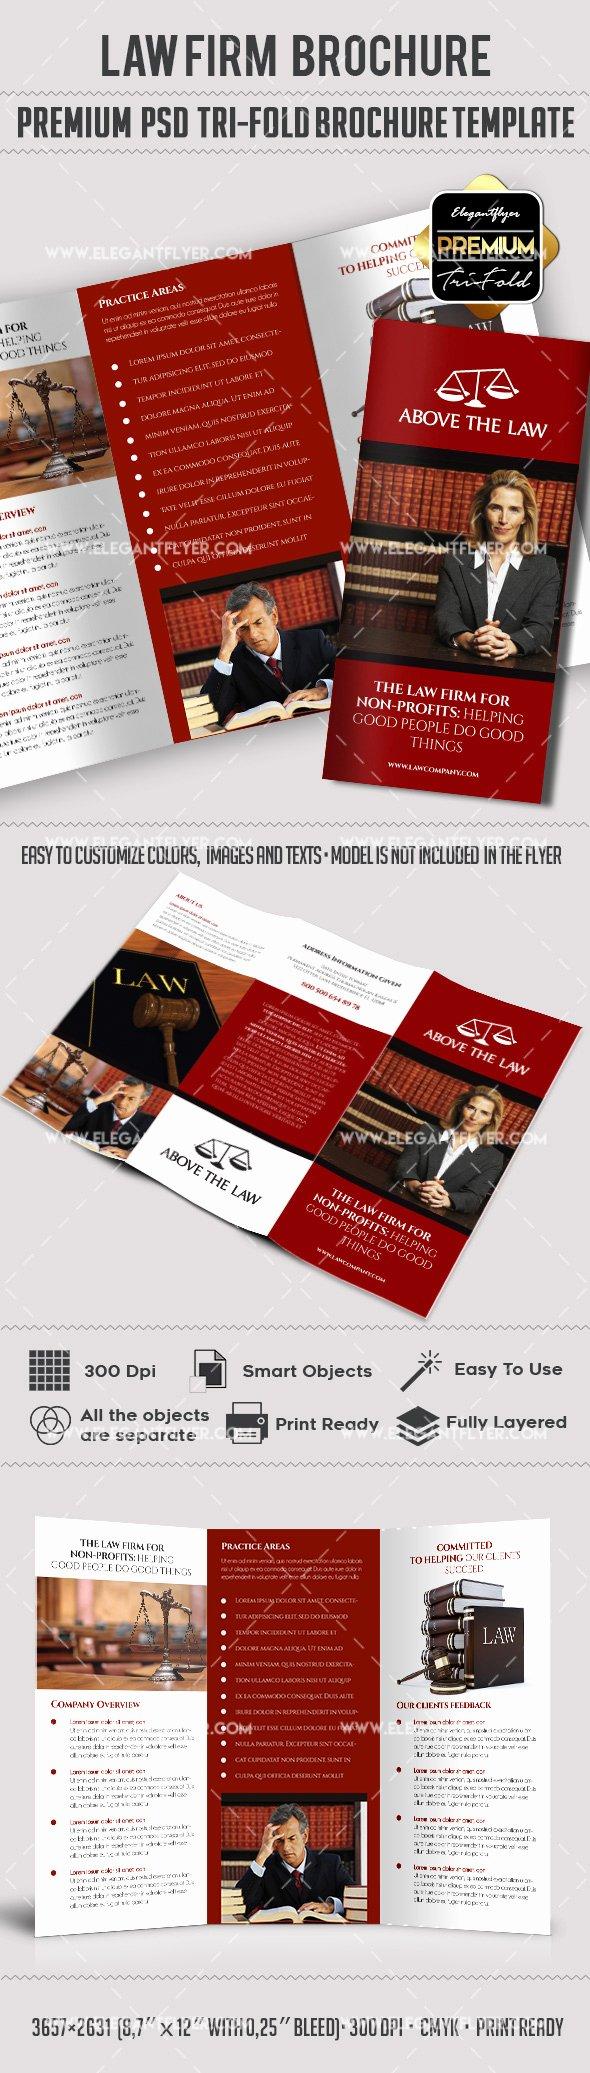 Tri Fold Brochure Template Psd New Law Pany – Premium Tri Fold Psd Brochure Template – by Elegantflyer